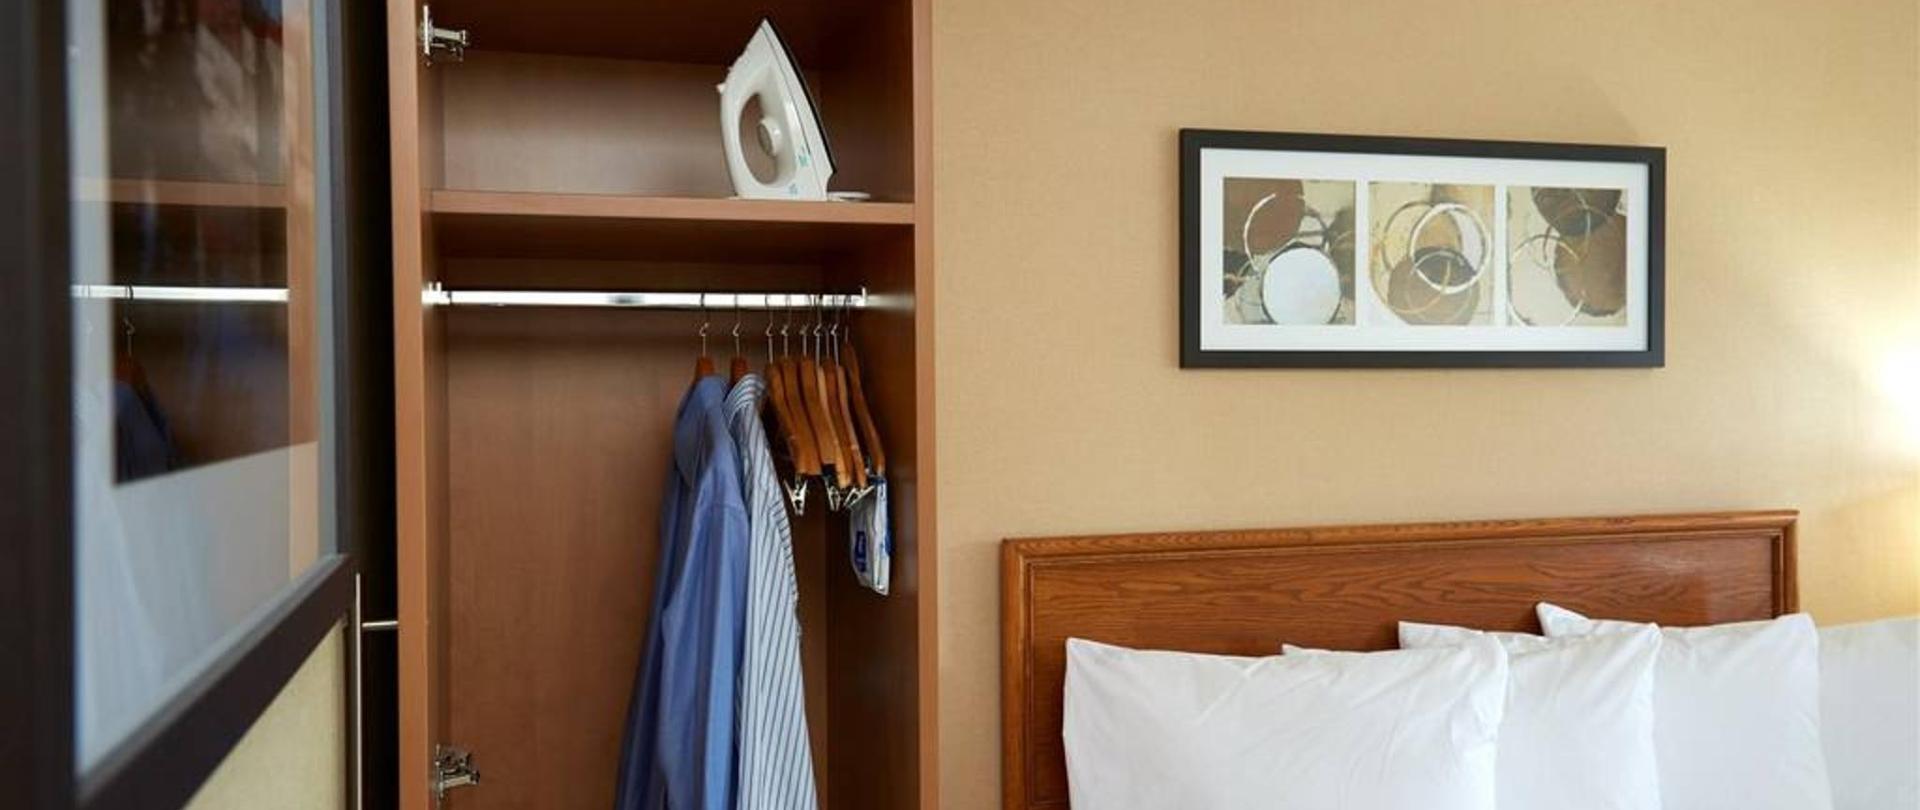 42-loads-of-closet-space.jpg.1024x0.jpg